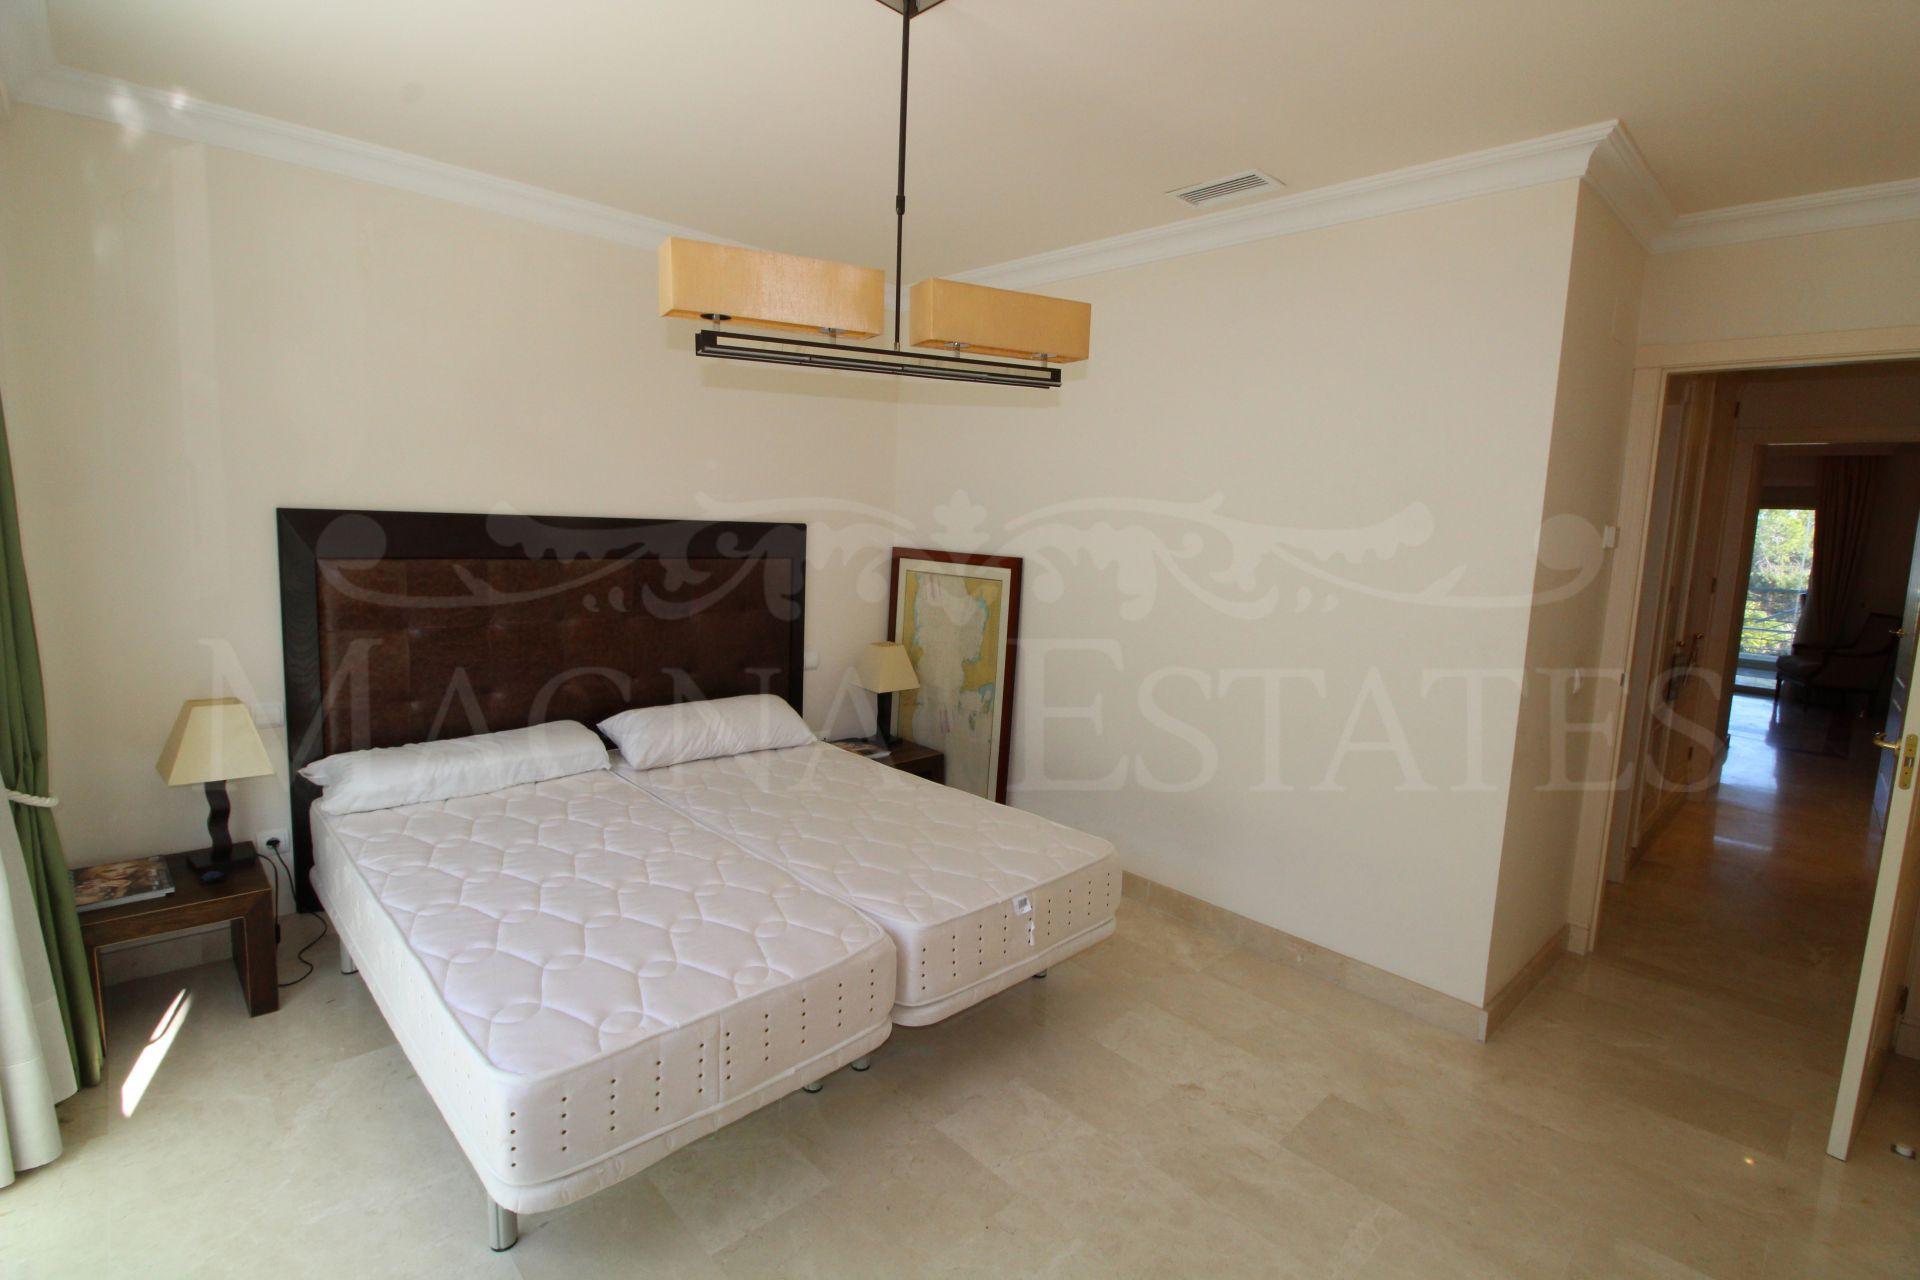 Two bedroom apartment in La Corniche, Nueva Andalucía